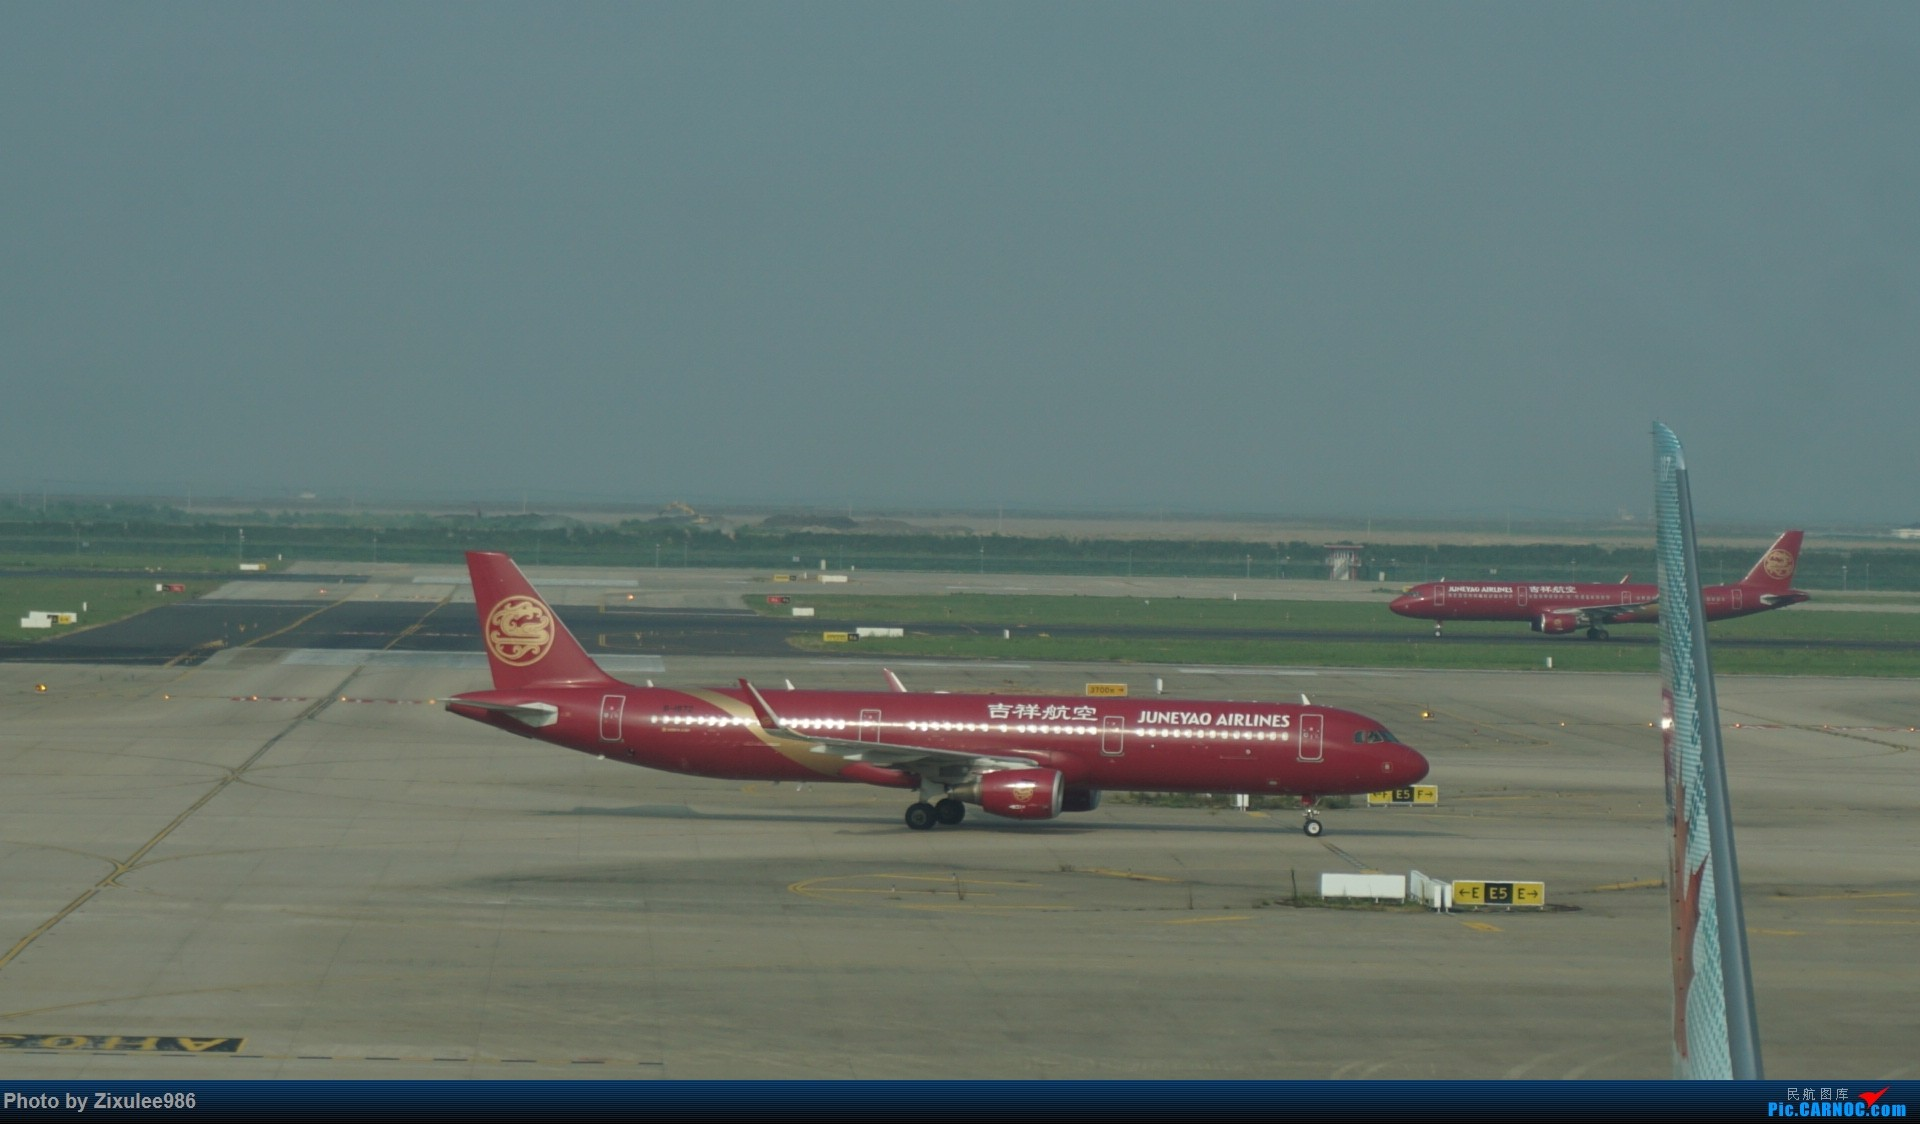 Re:[原创]加拿大21日游学之旅(一)~JJN-PVG-YYZ..(内含flightlog)~第一次发游记~多图缓更请谅解 AIRBUS A321-200 B-1872 中国上海浦东国际机场